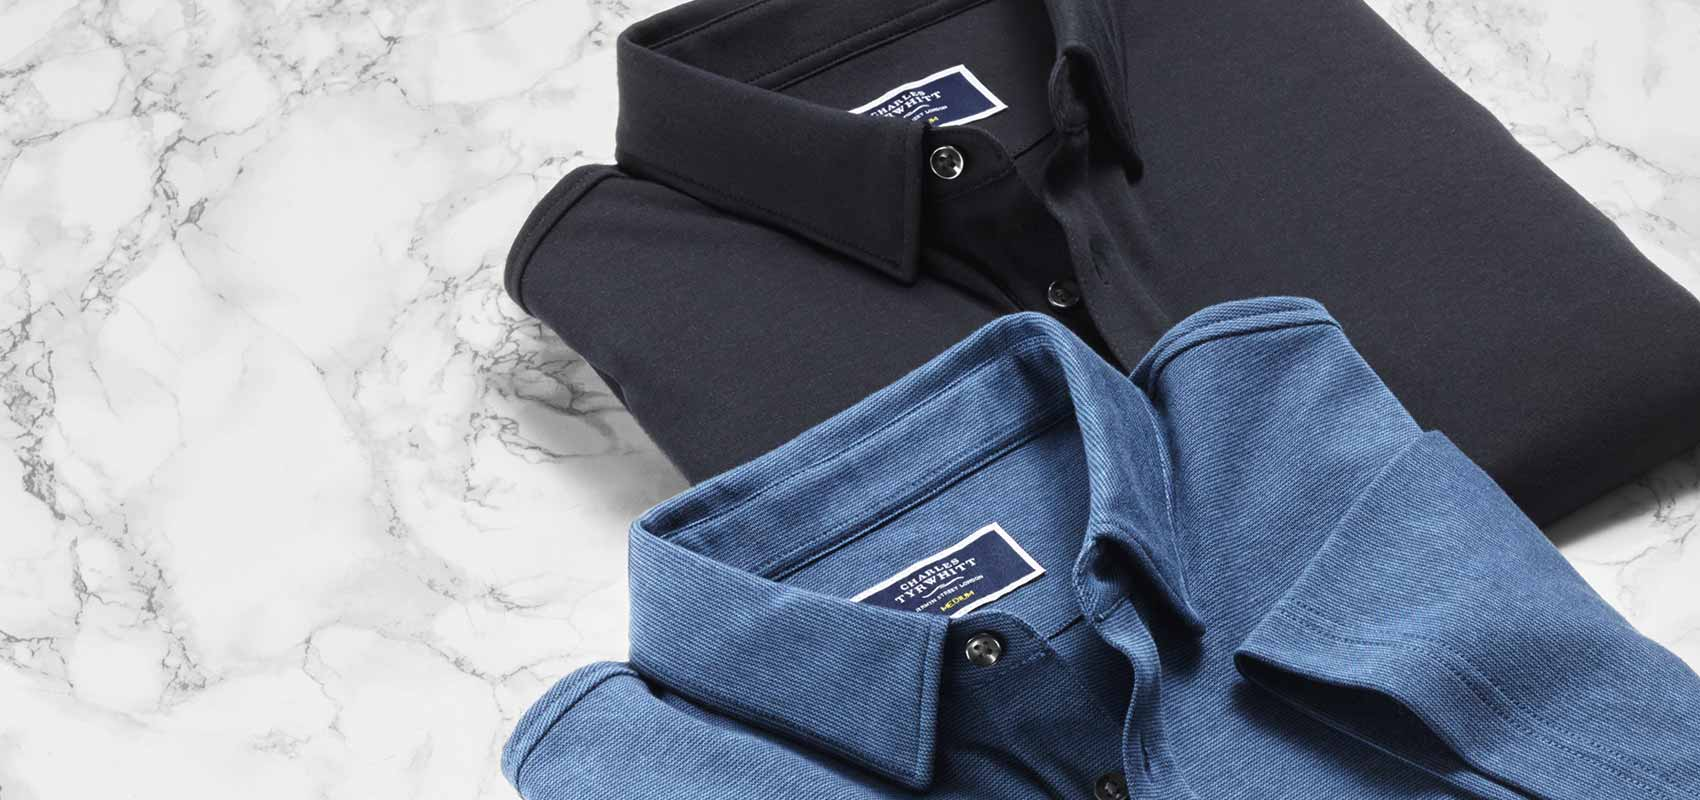 Charles tyrwhitt polo shirt review